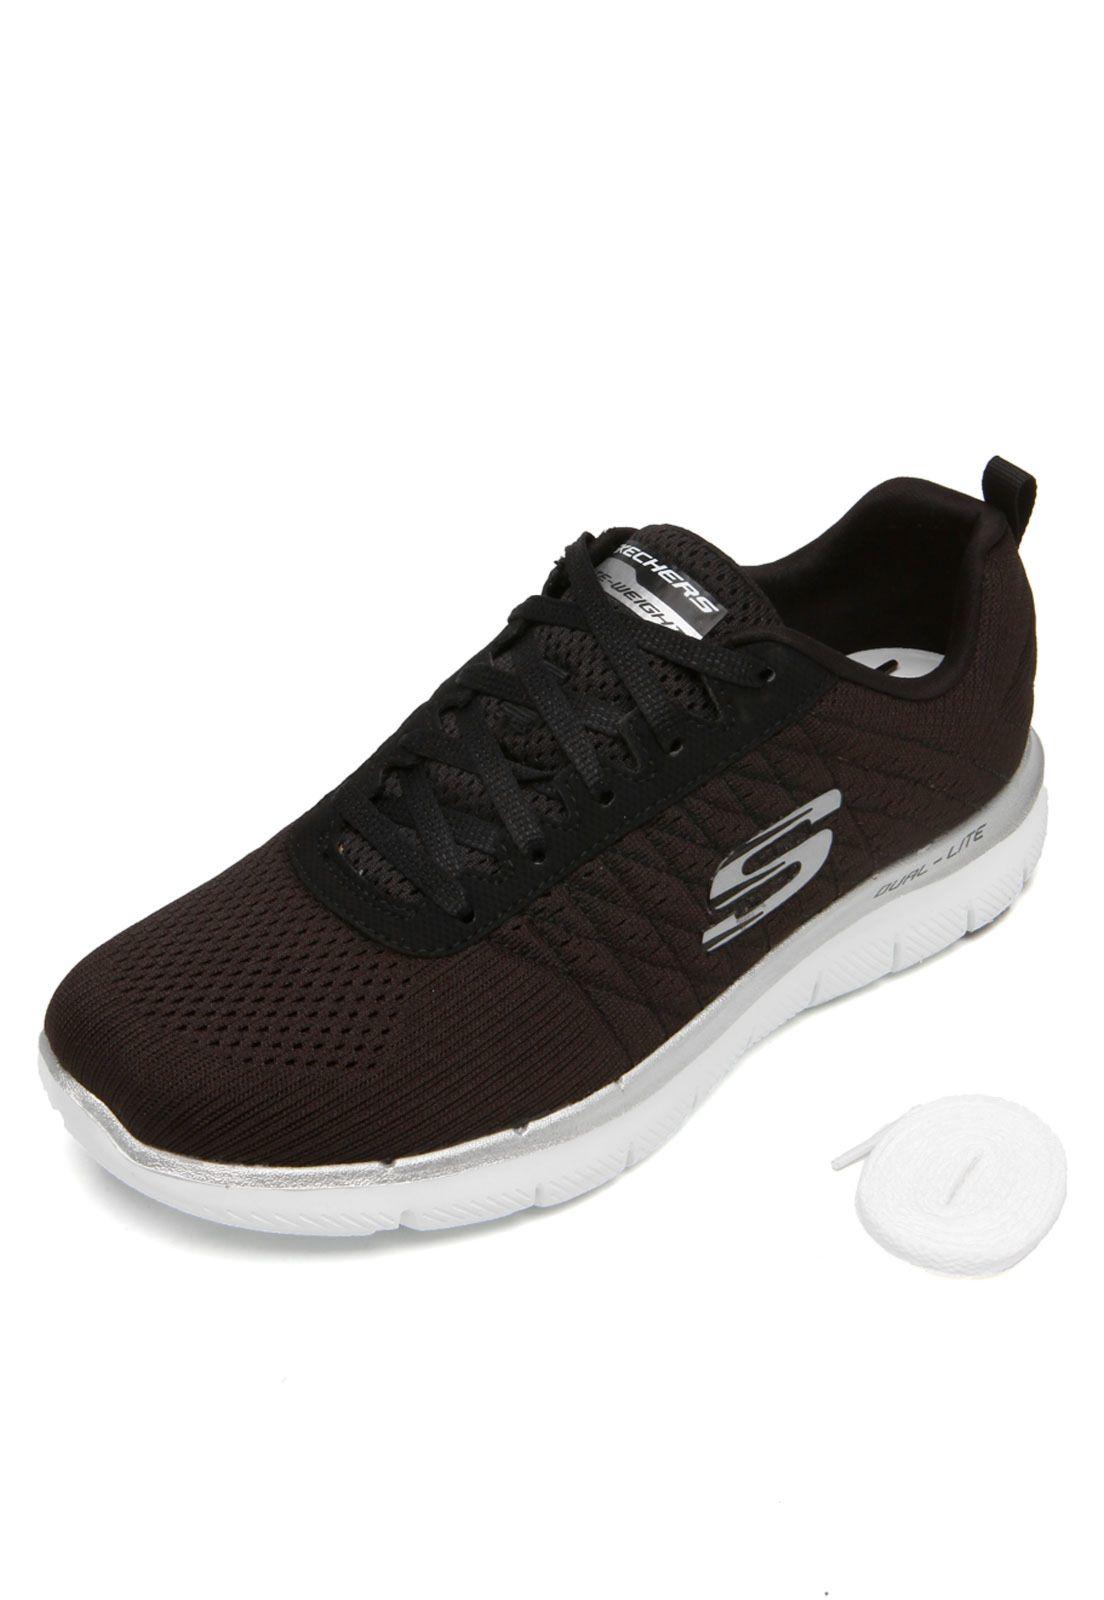 Tênis Skechers Flex Appeal 2.0 Marrom | Marrom, Sapatos e Tenis